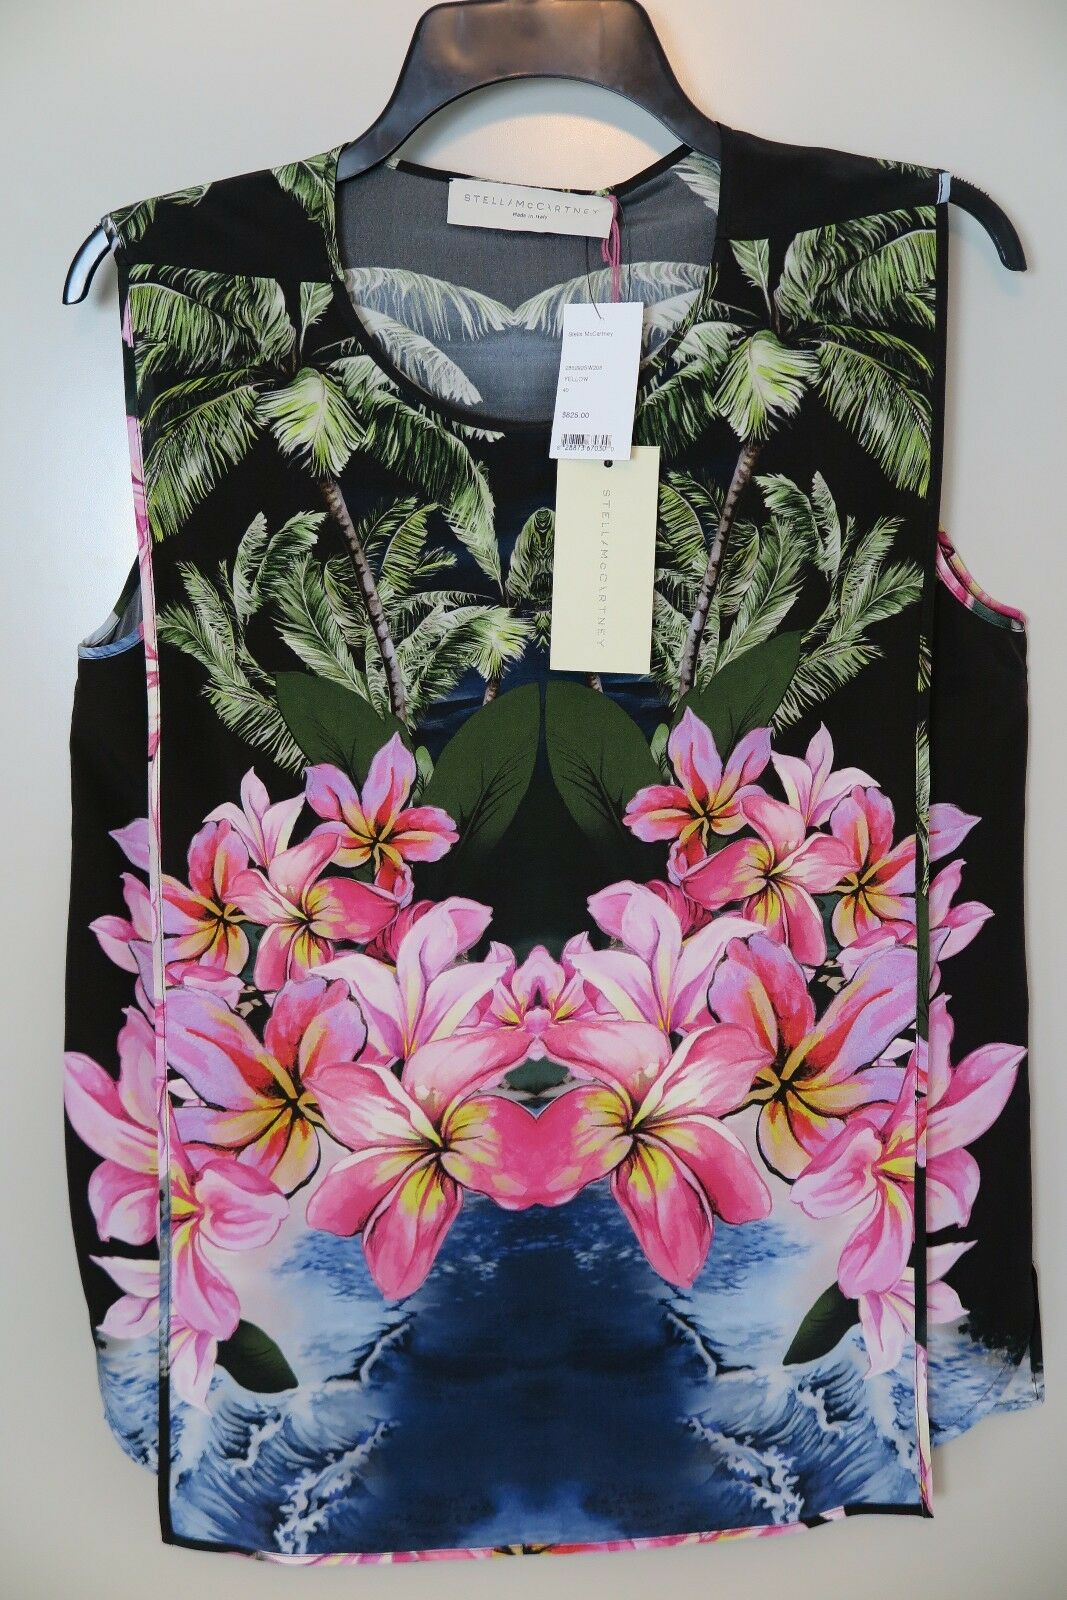 NWT Stella McCartney Tropical Flora Sleeveless Blouse Größe 40 MSRP 825